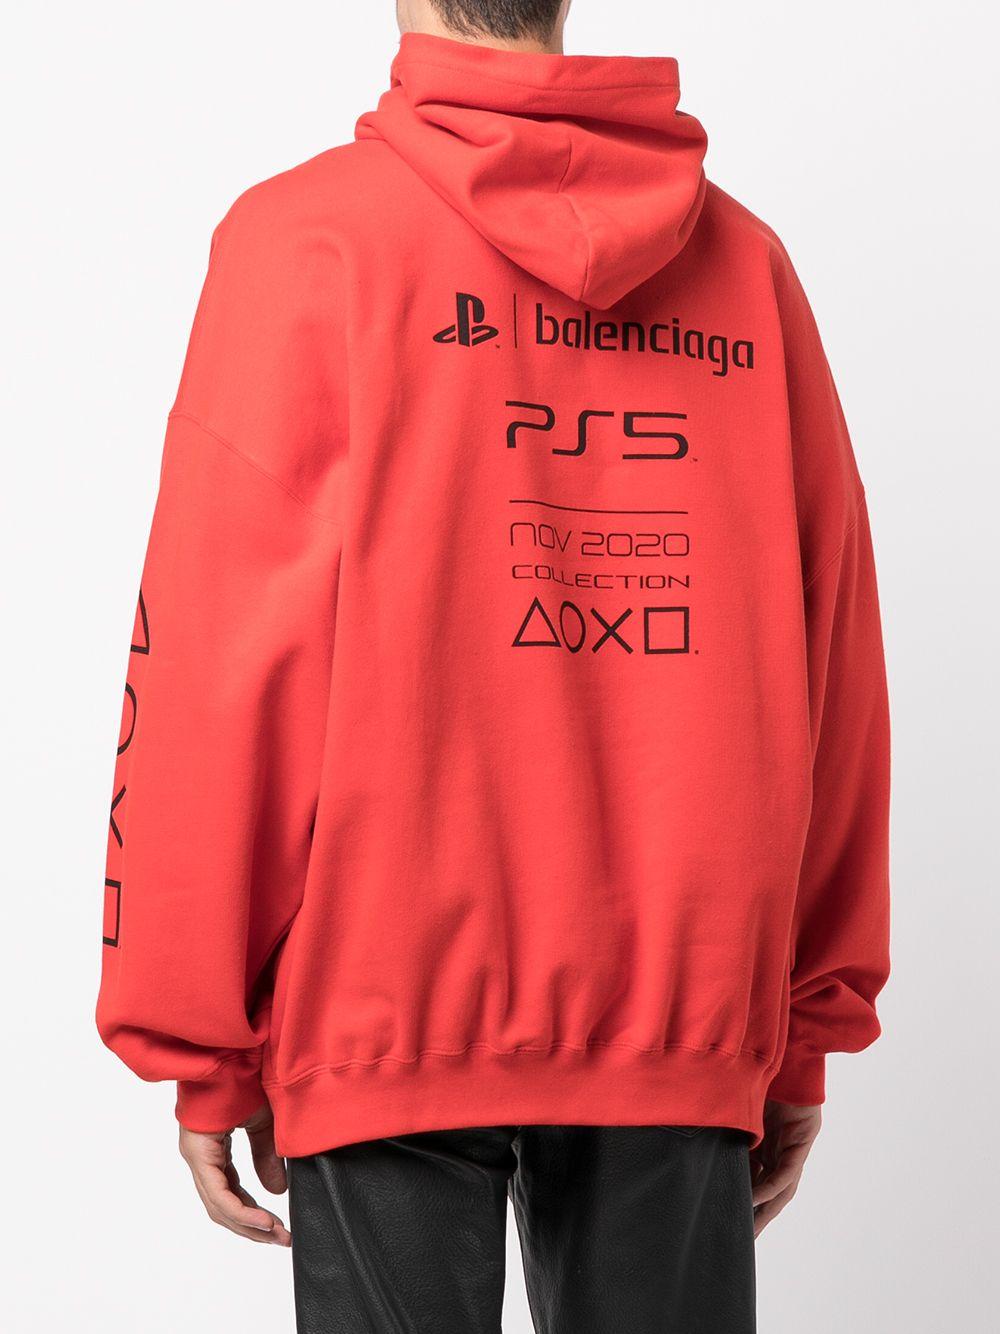 Picture of Balenciaga   Boxy Ps5 Sweatshirt